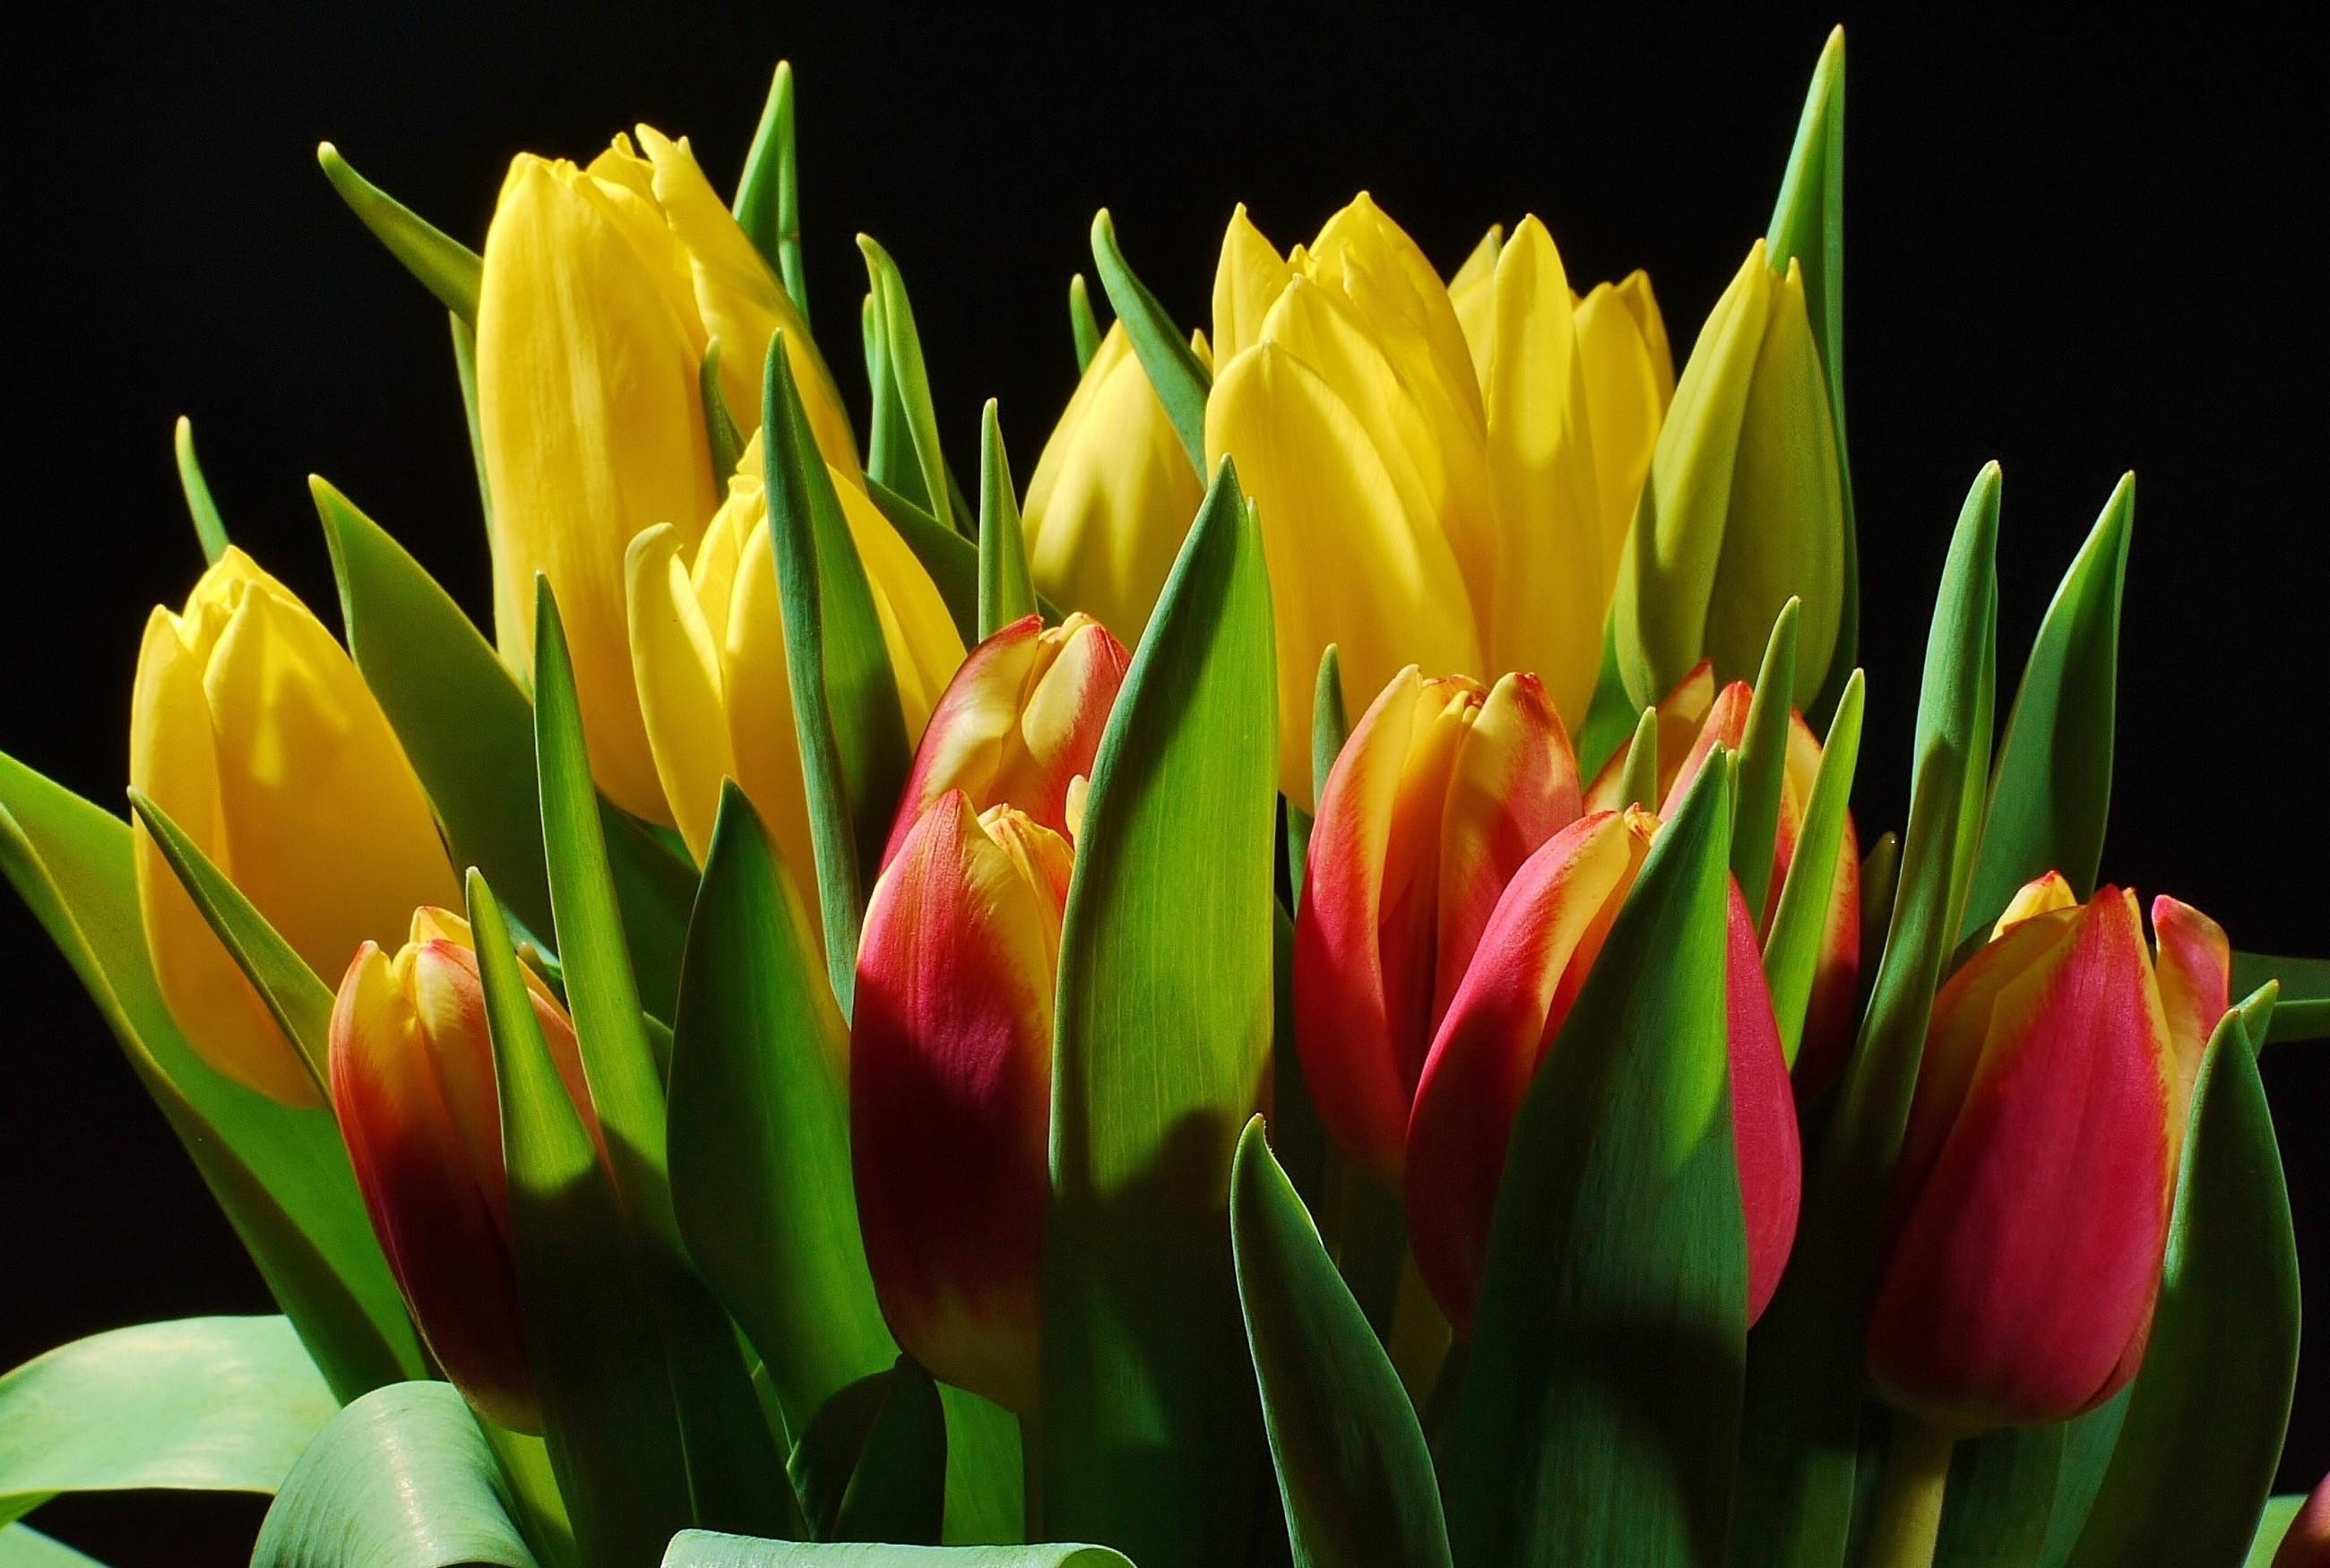 Wallpaper Tulips Flowers Buds Flower Light Black Background 2600x1750 4kwallpaper 688588 Hd Wallpapers Wallhere